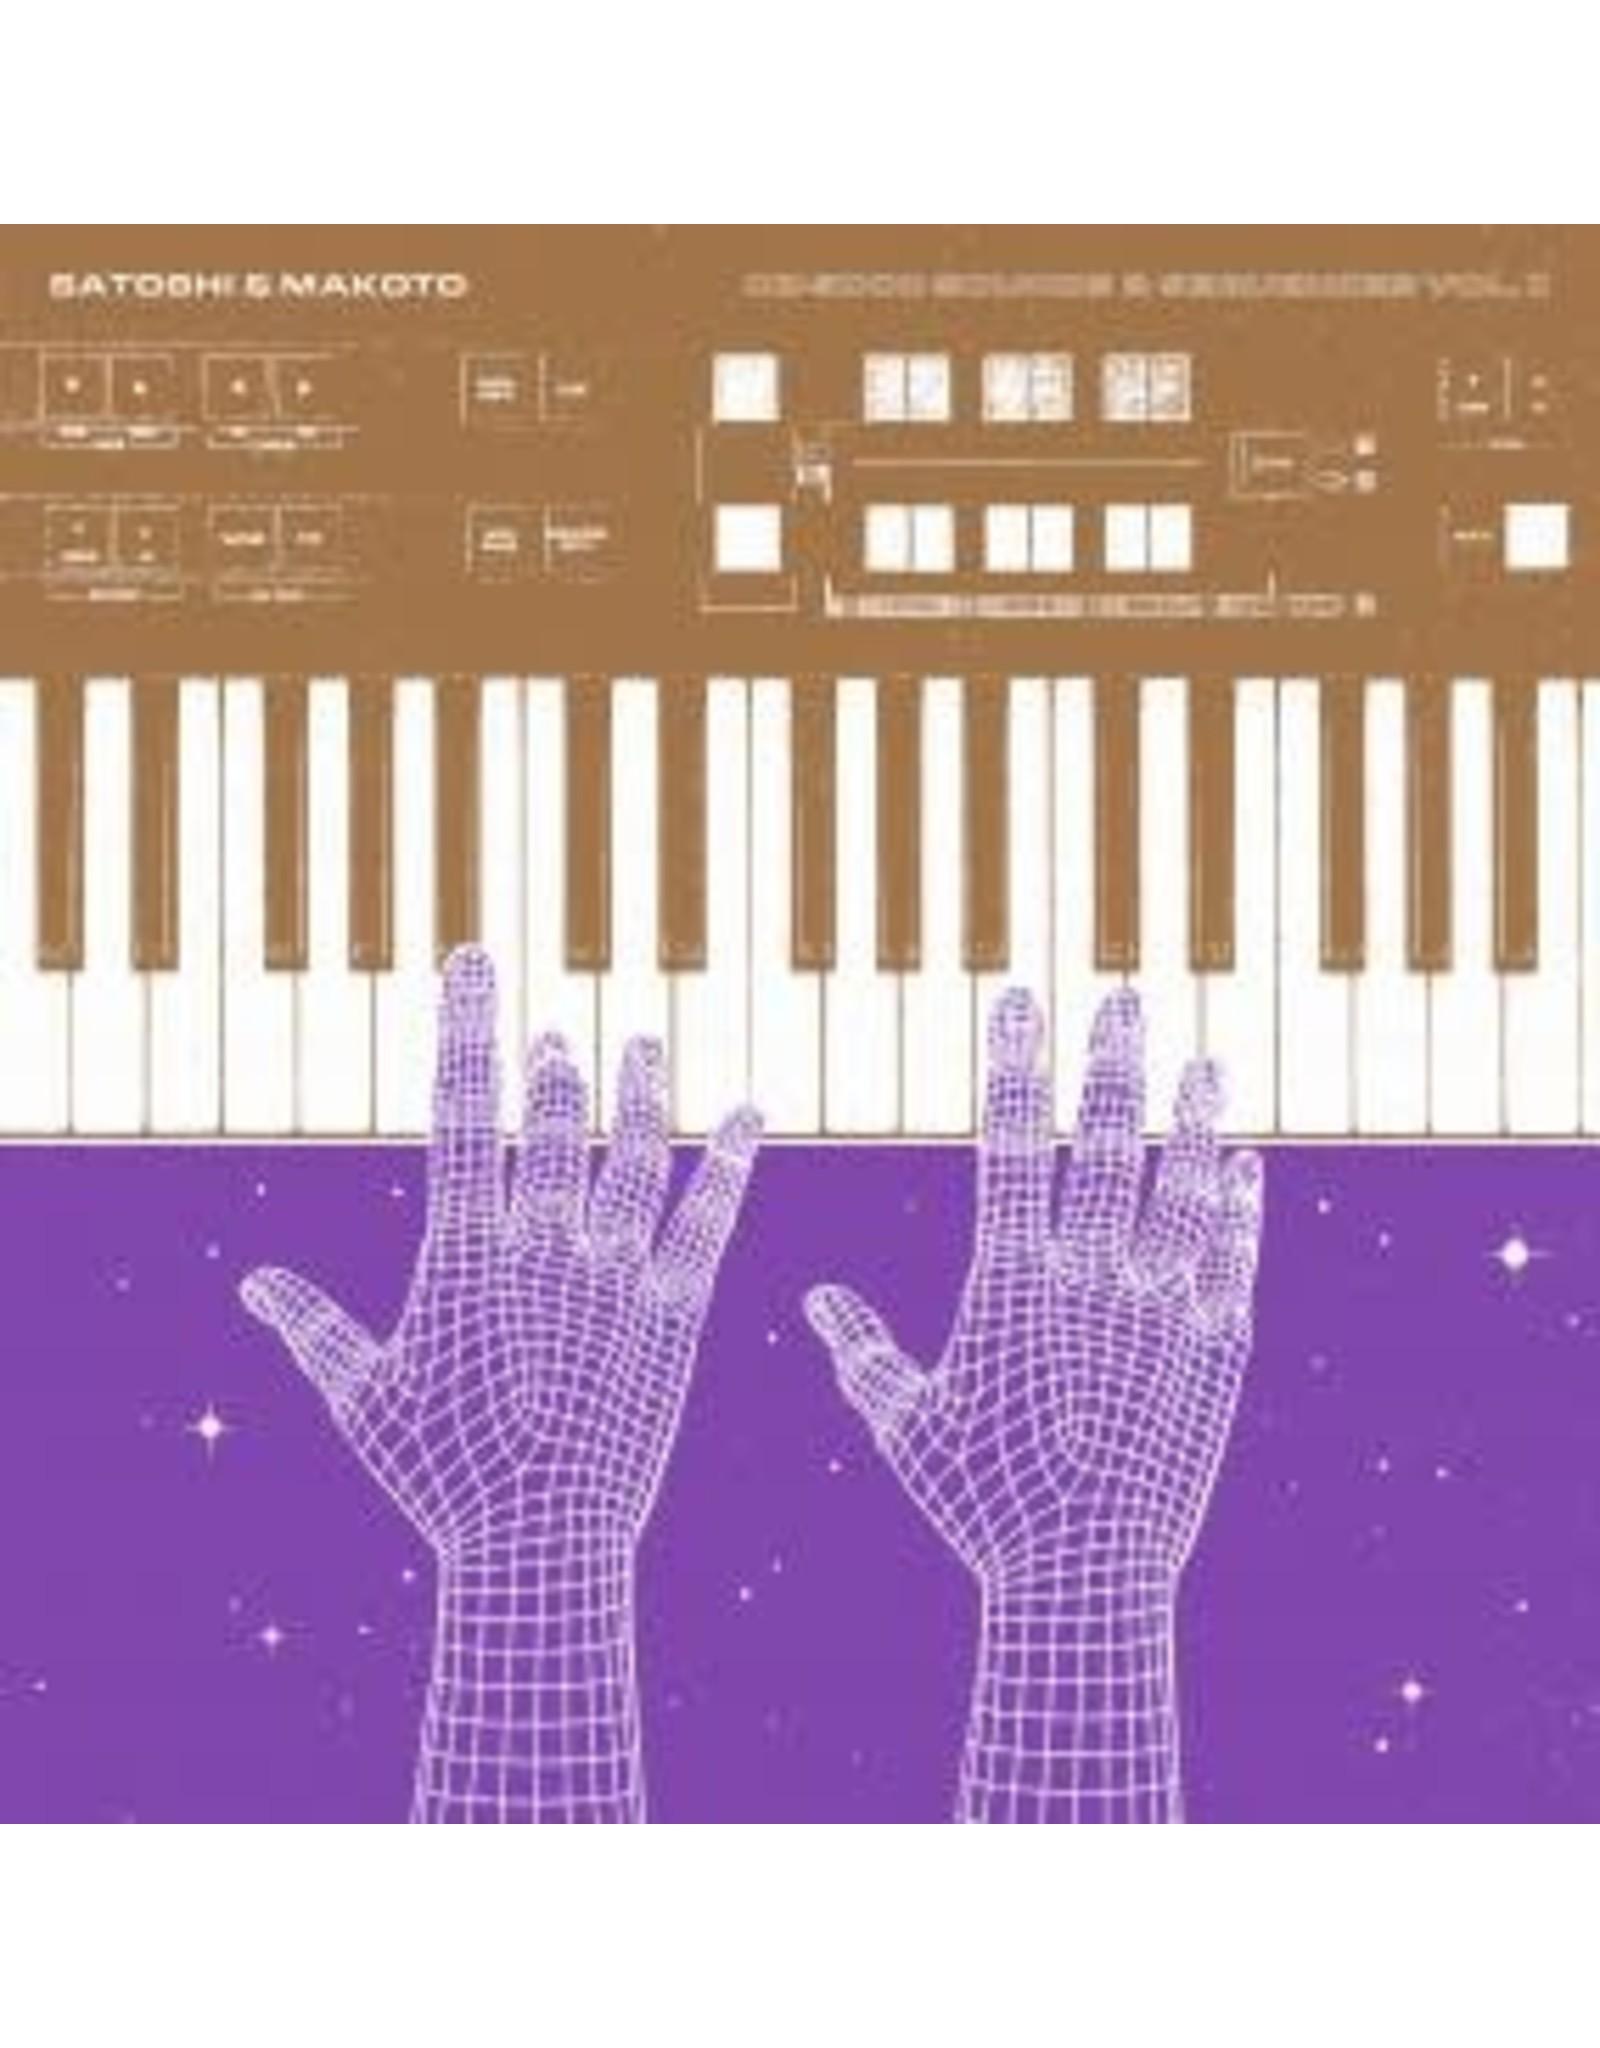 Safe Trip Satoshi & Makoto: CZ5000 Sounds & Sequences Vol II LP